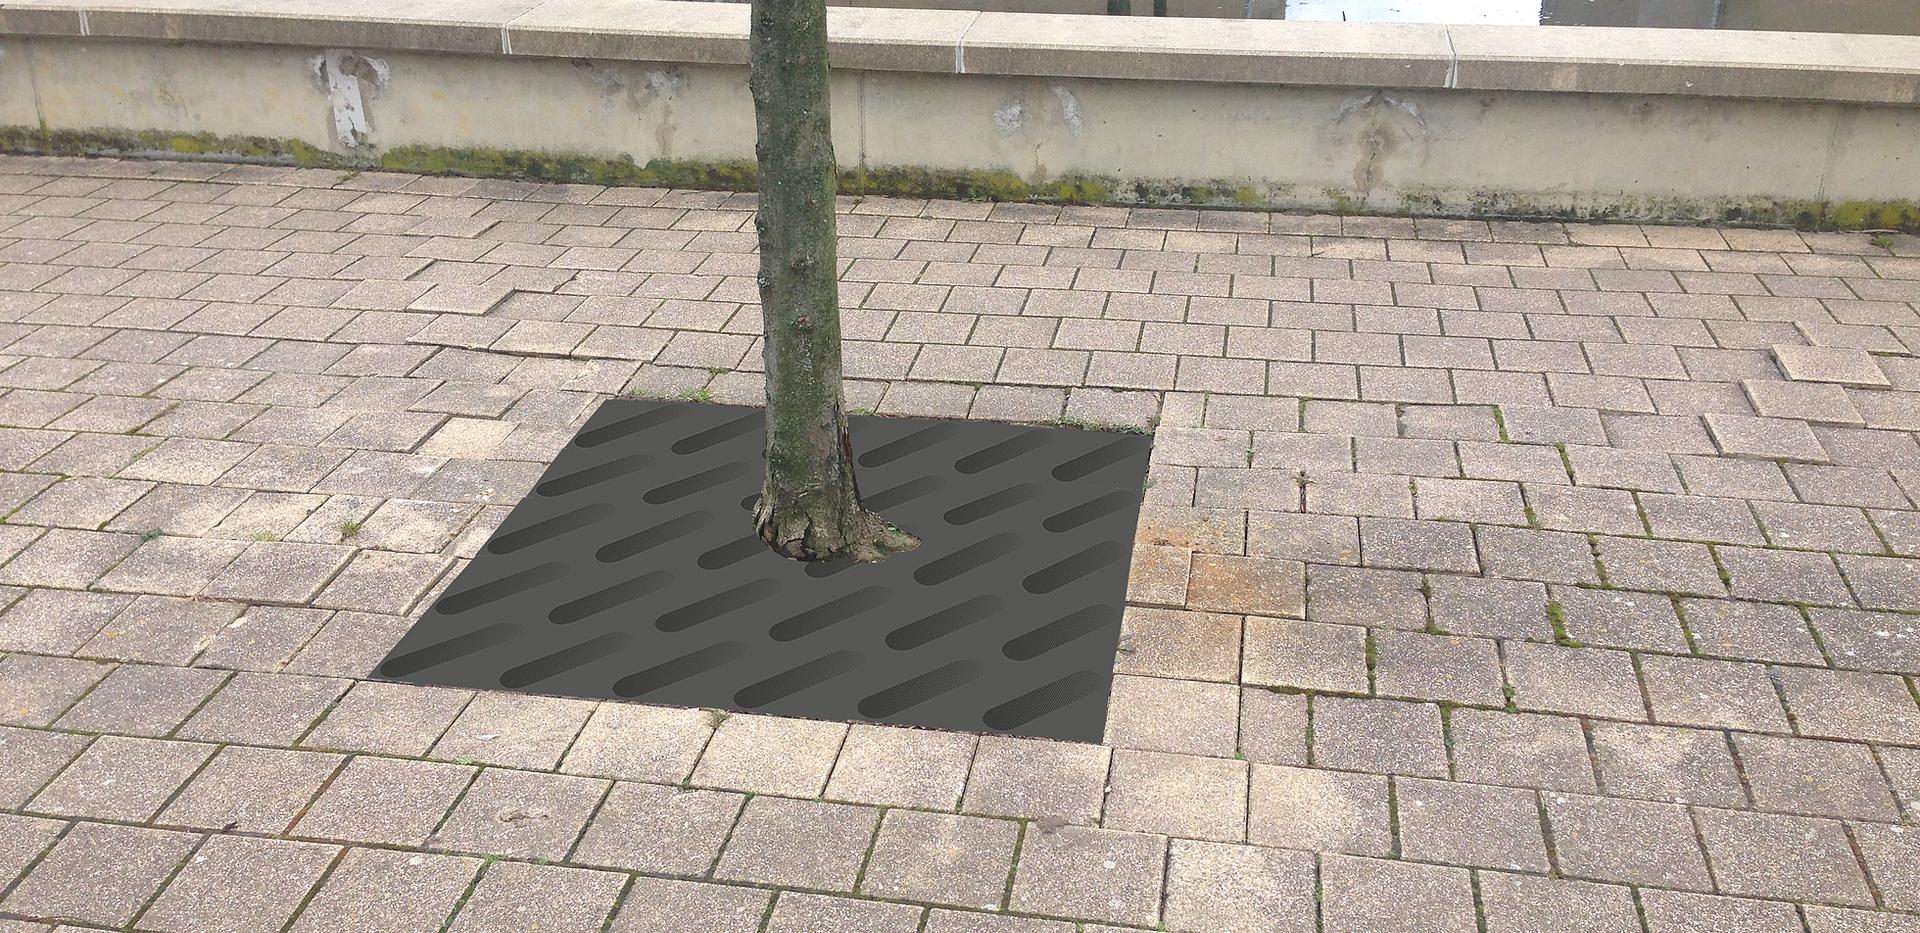 Grid tiles